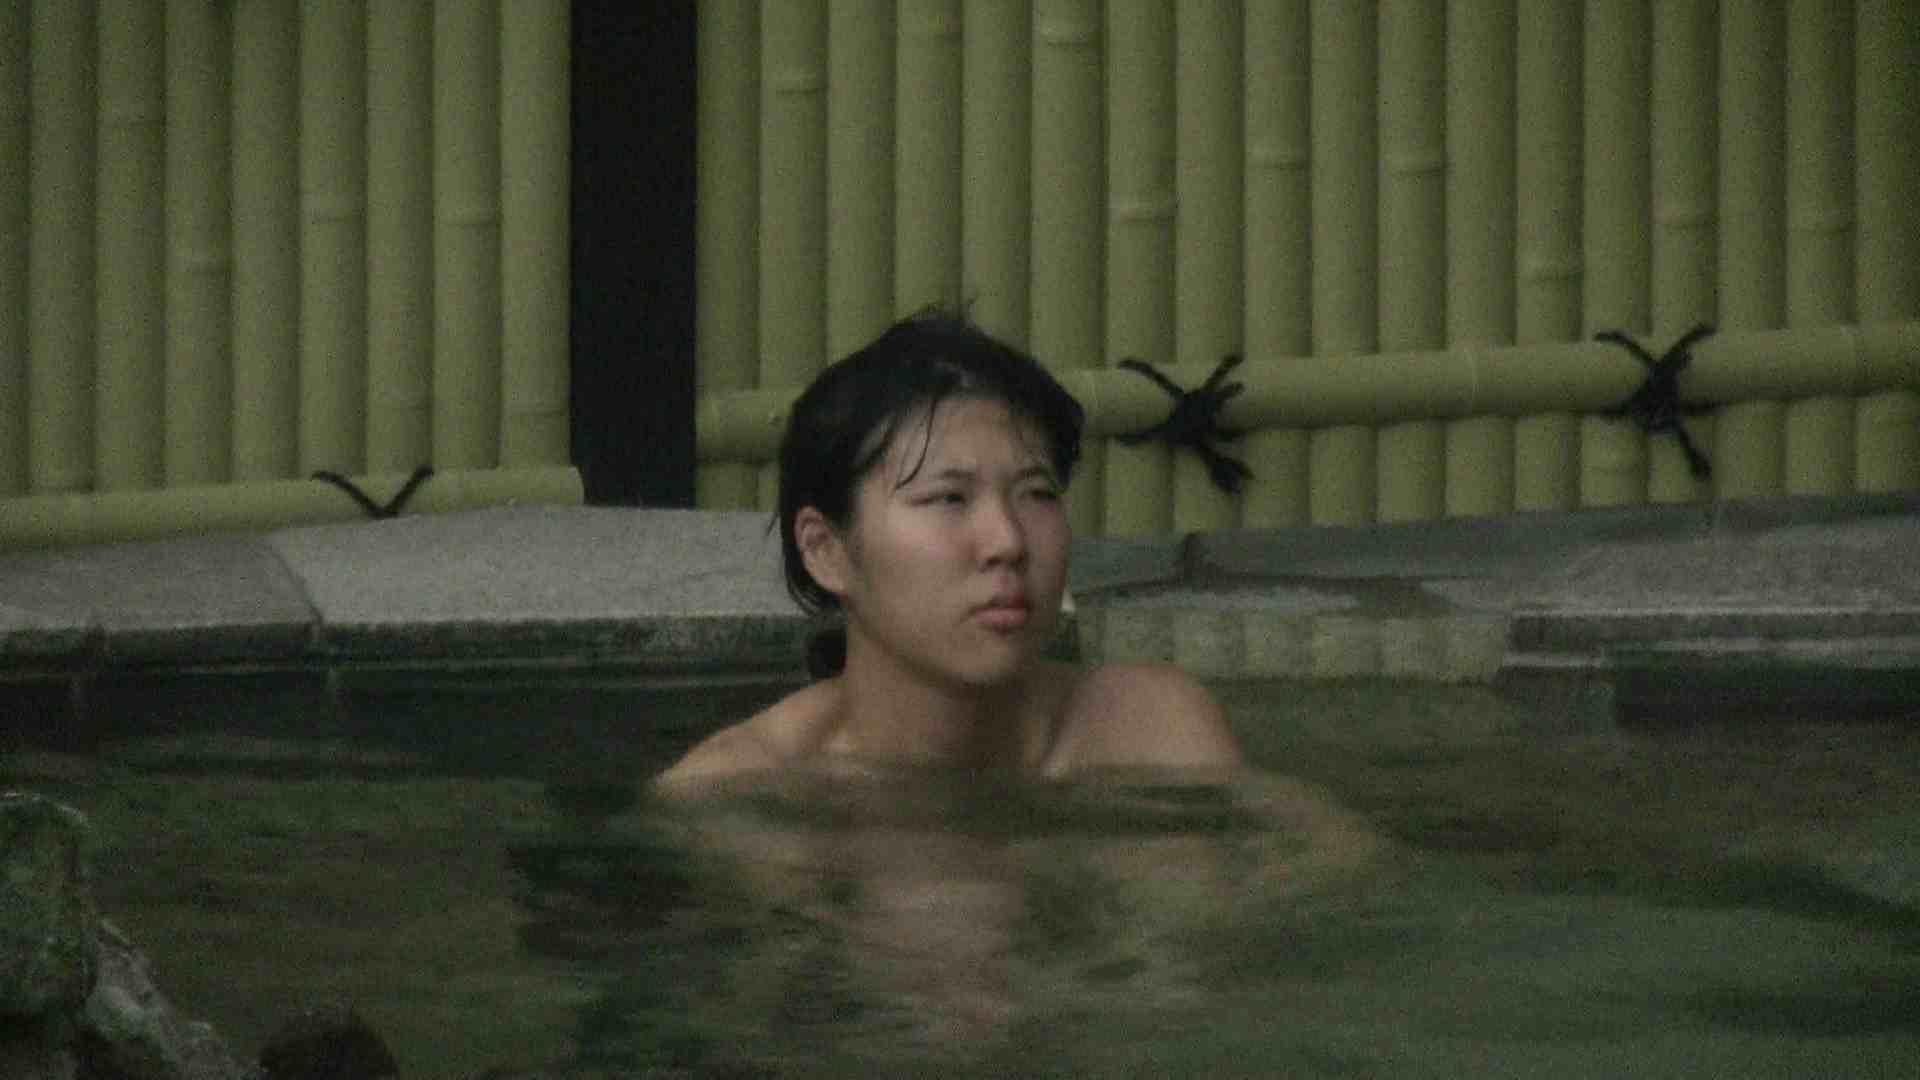 Aquaな露天風呂Vol.215 綺麗なOLたち  106枚 6